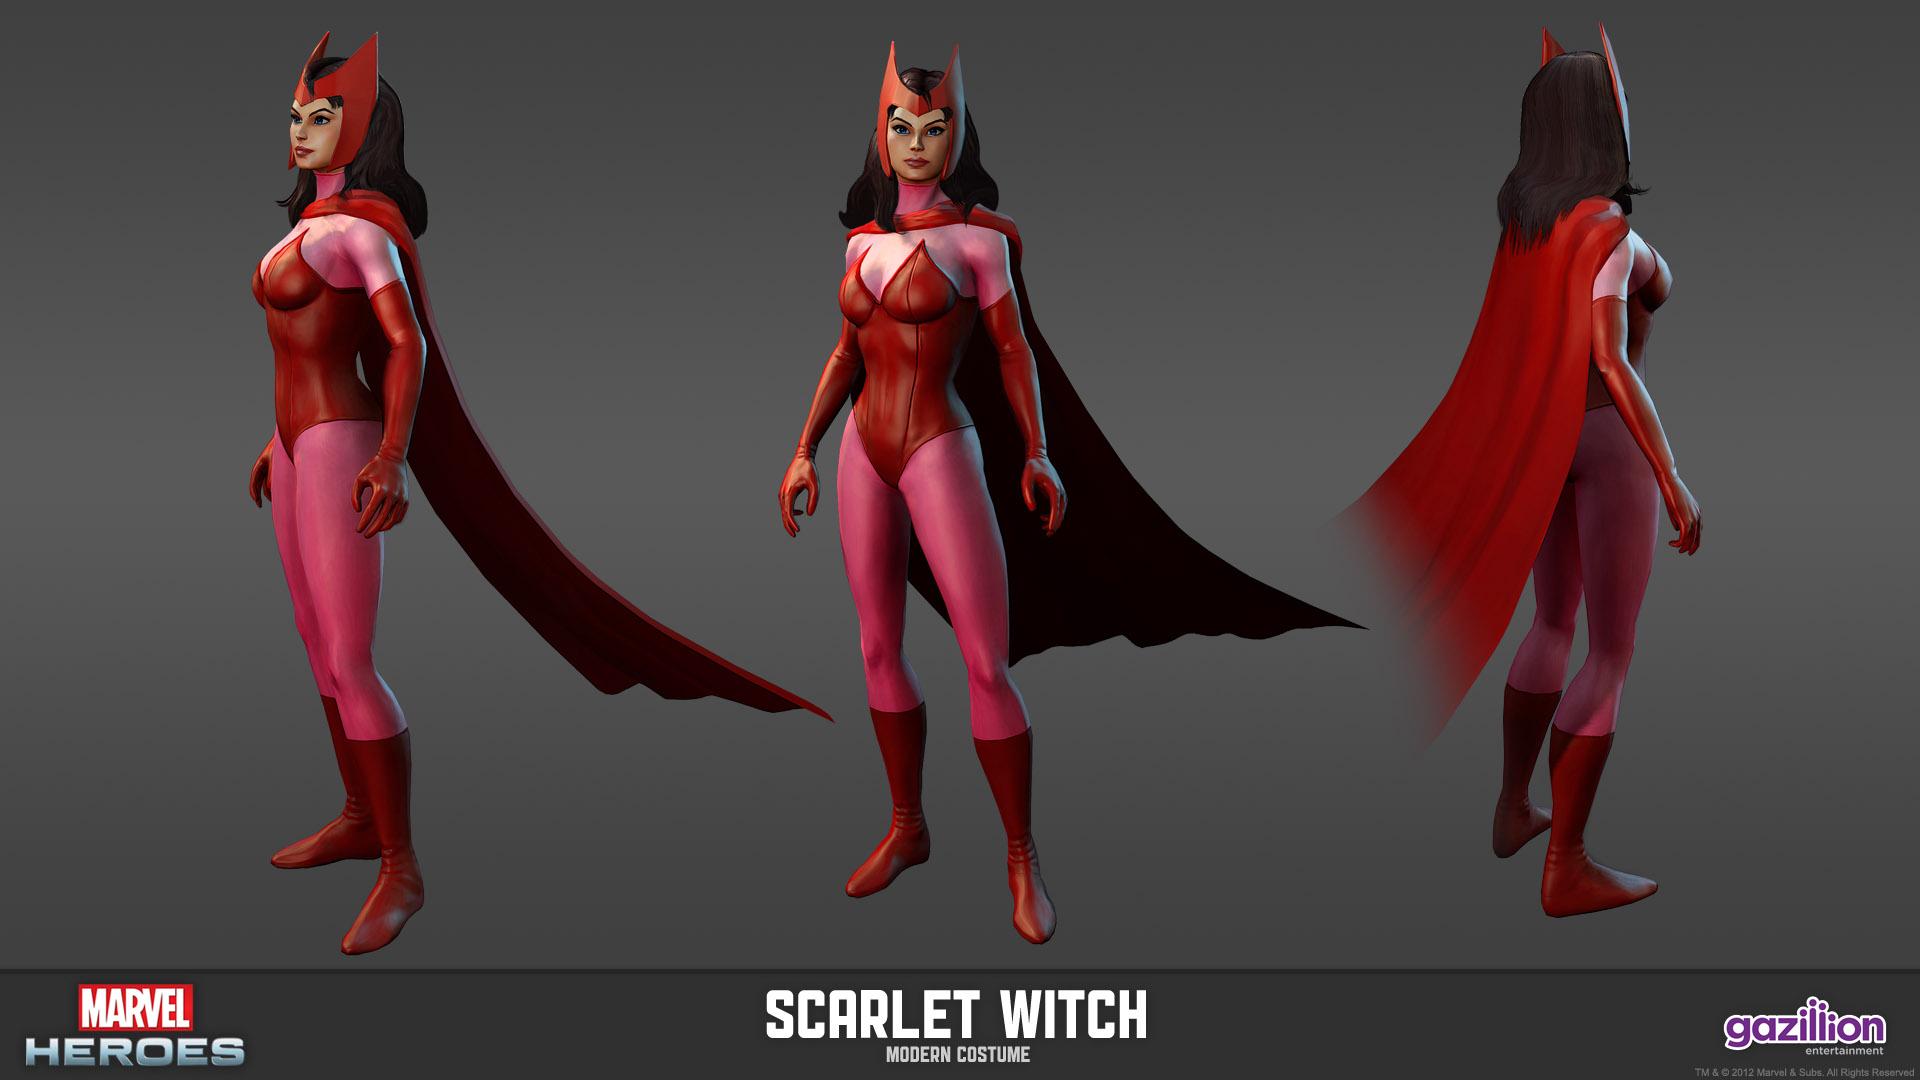 Good Wallpaper Marvel Scarlet Witch - latest?cb\u003d20120713162725  Pic_628668.jpg/revision/latest?cb\u003d20120713162725